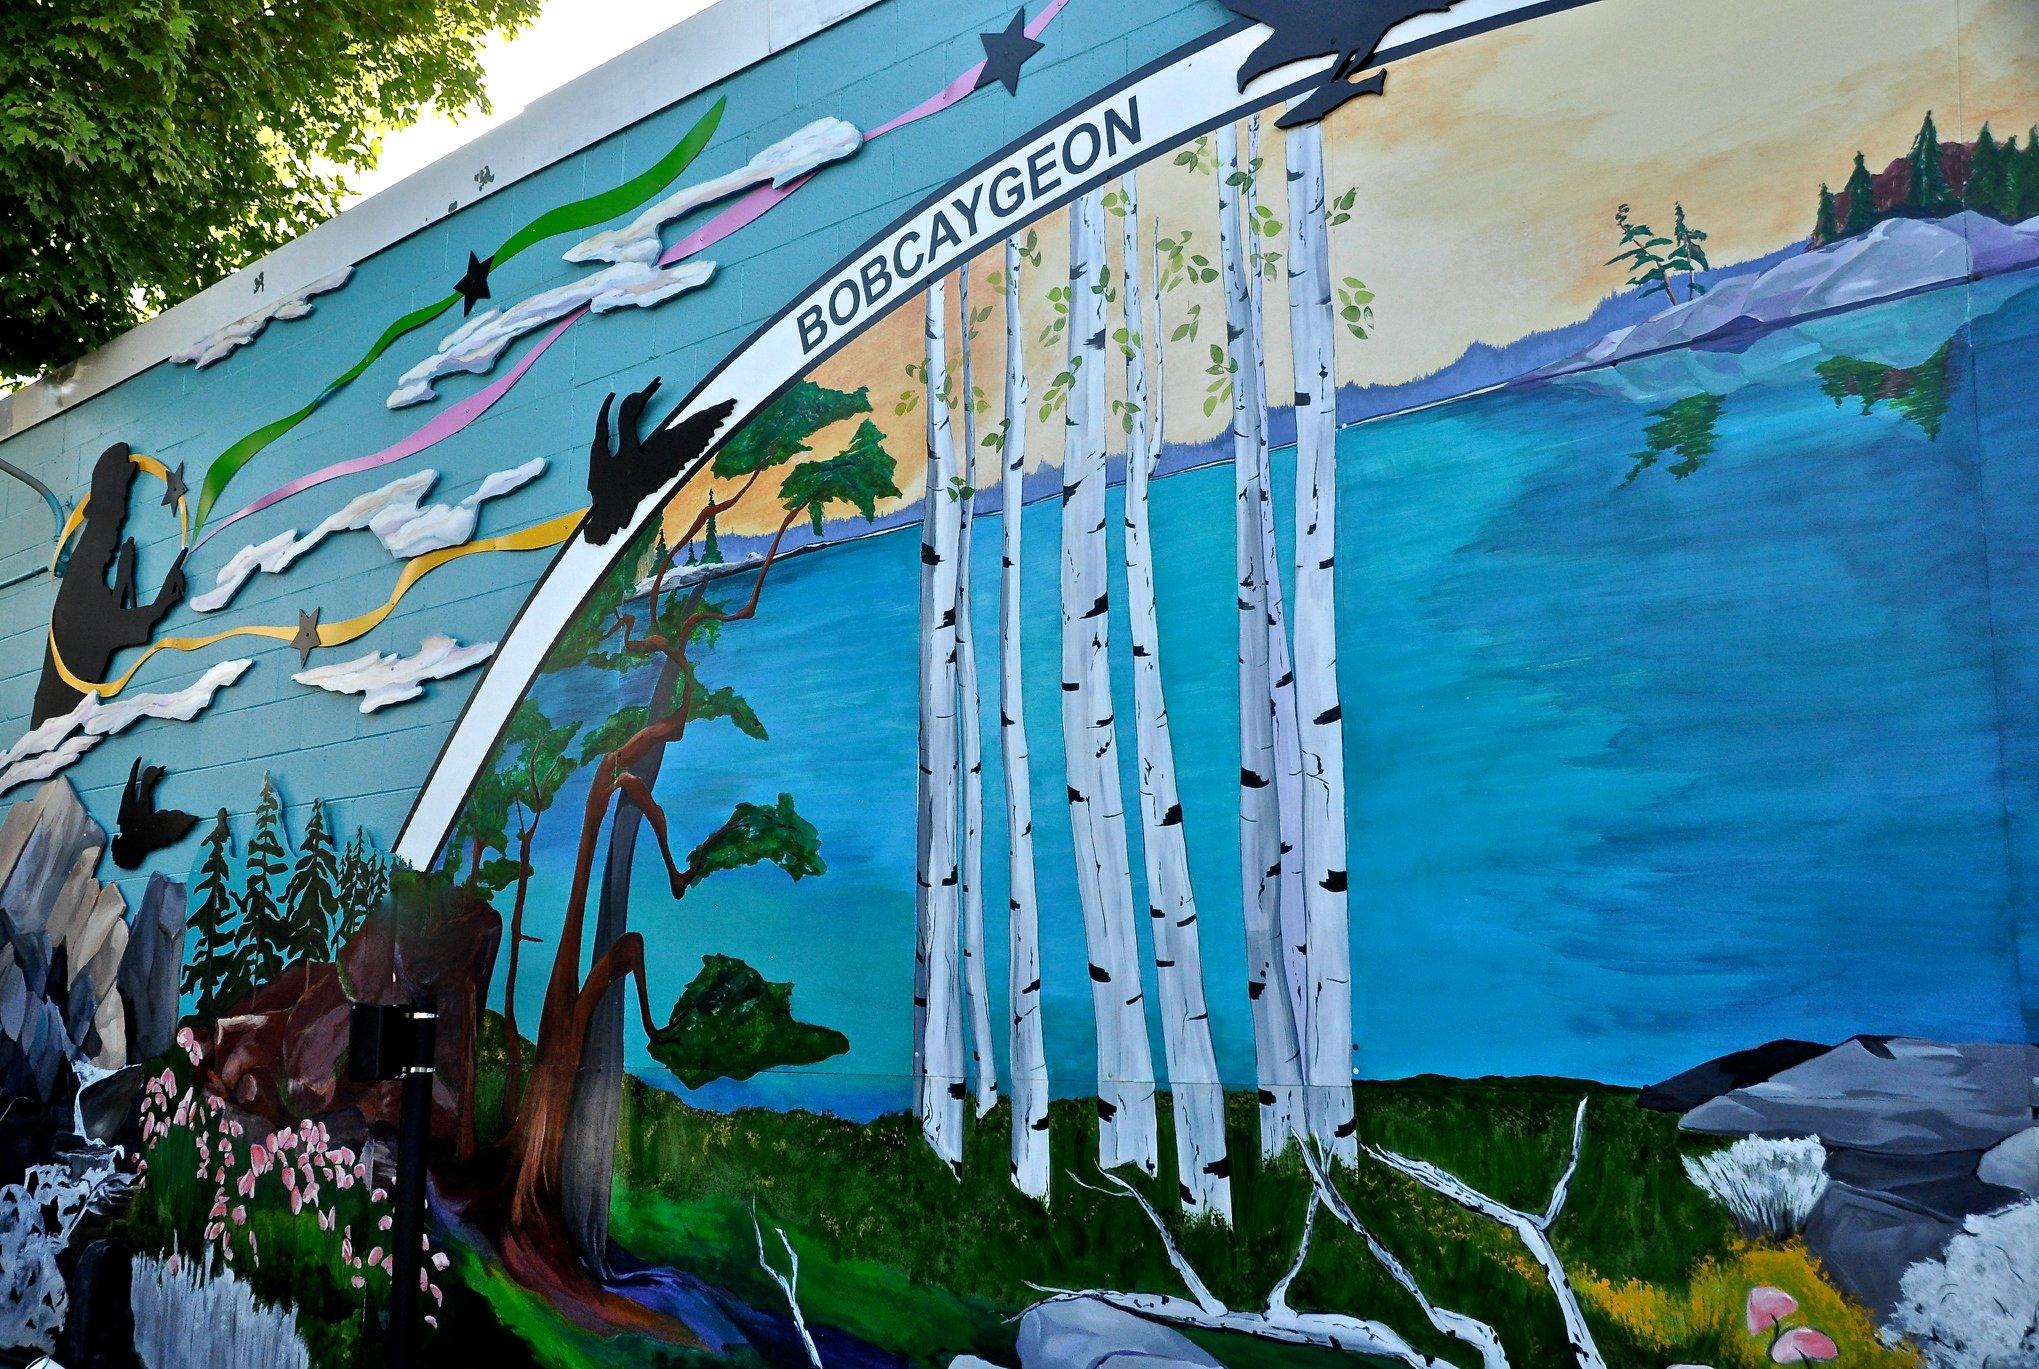 cib house 2018 mural.jpg